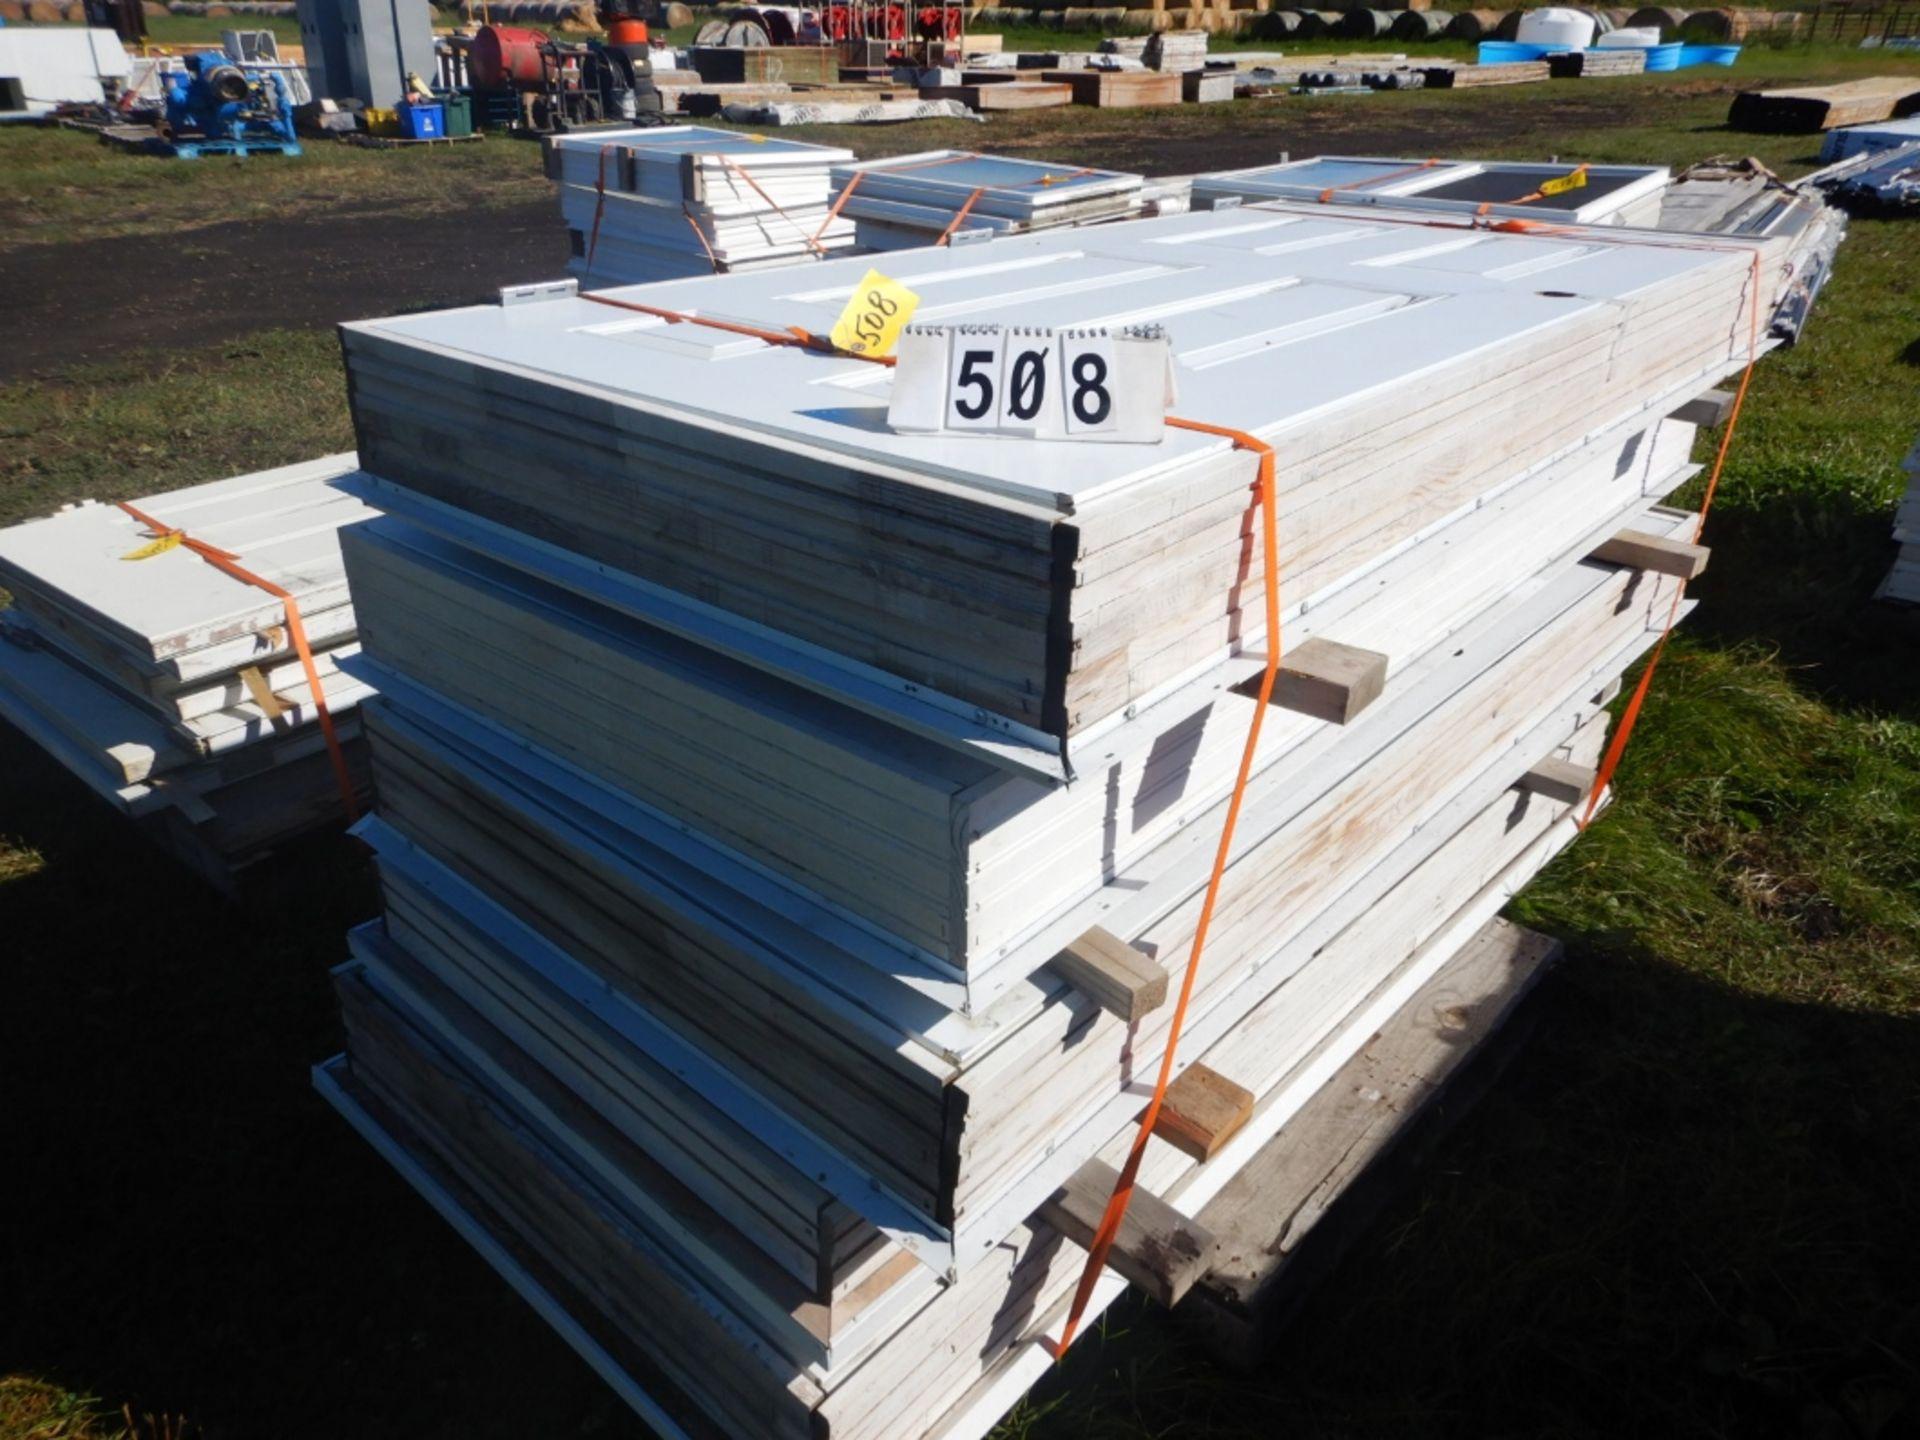 "Lot 508 - L/O 5-36""X80"" EXTERIOR DOORS W/JAMS"